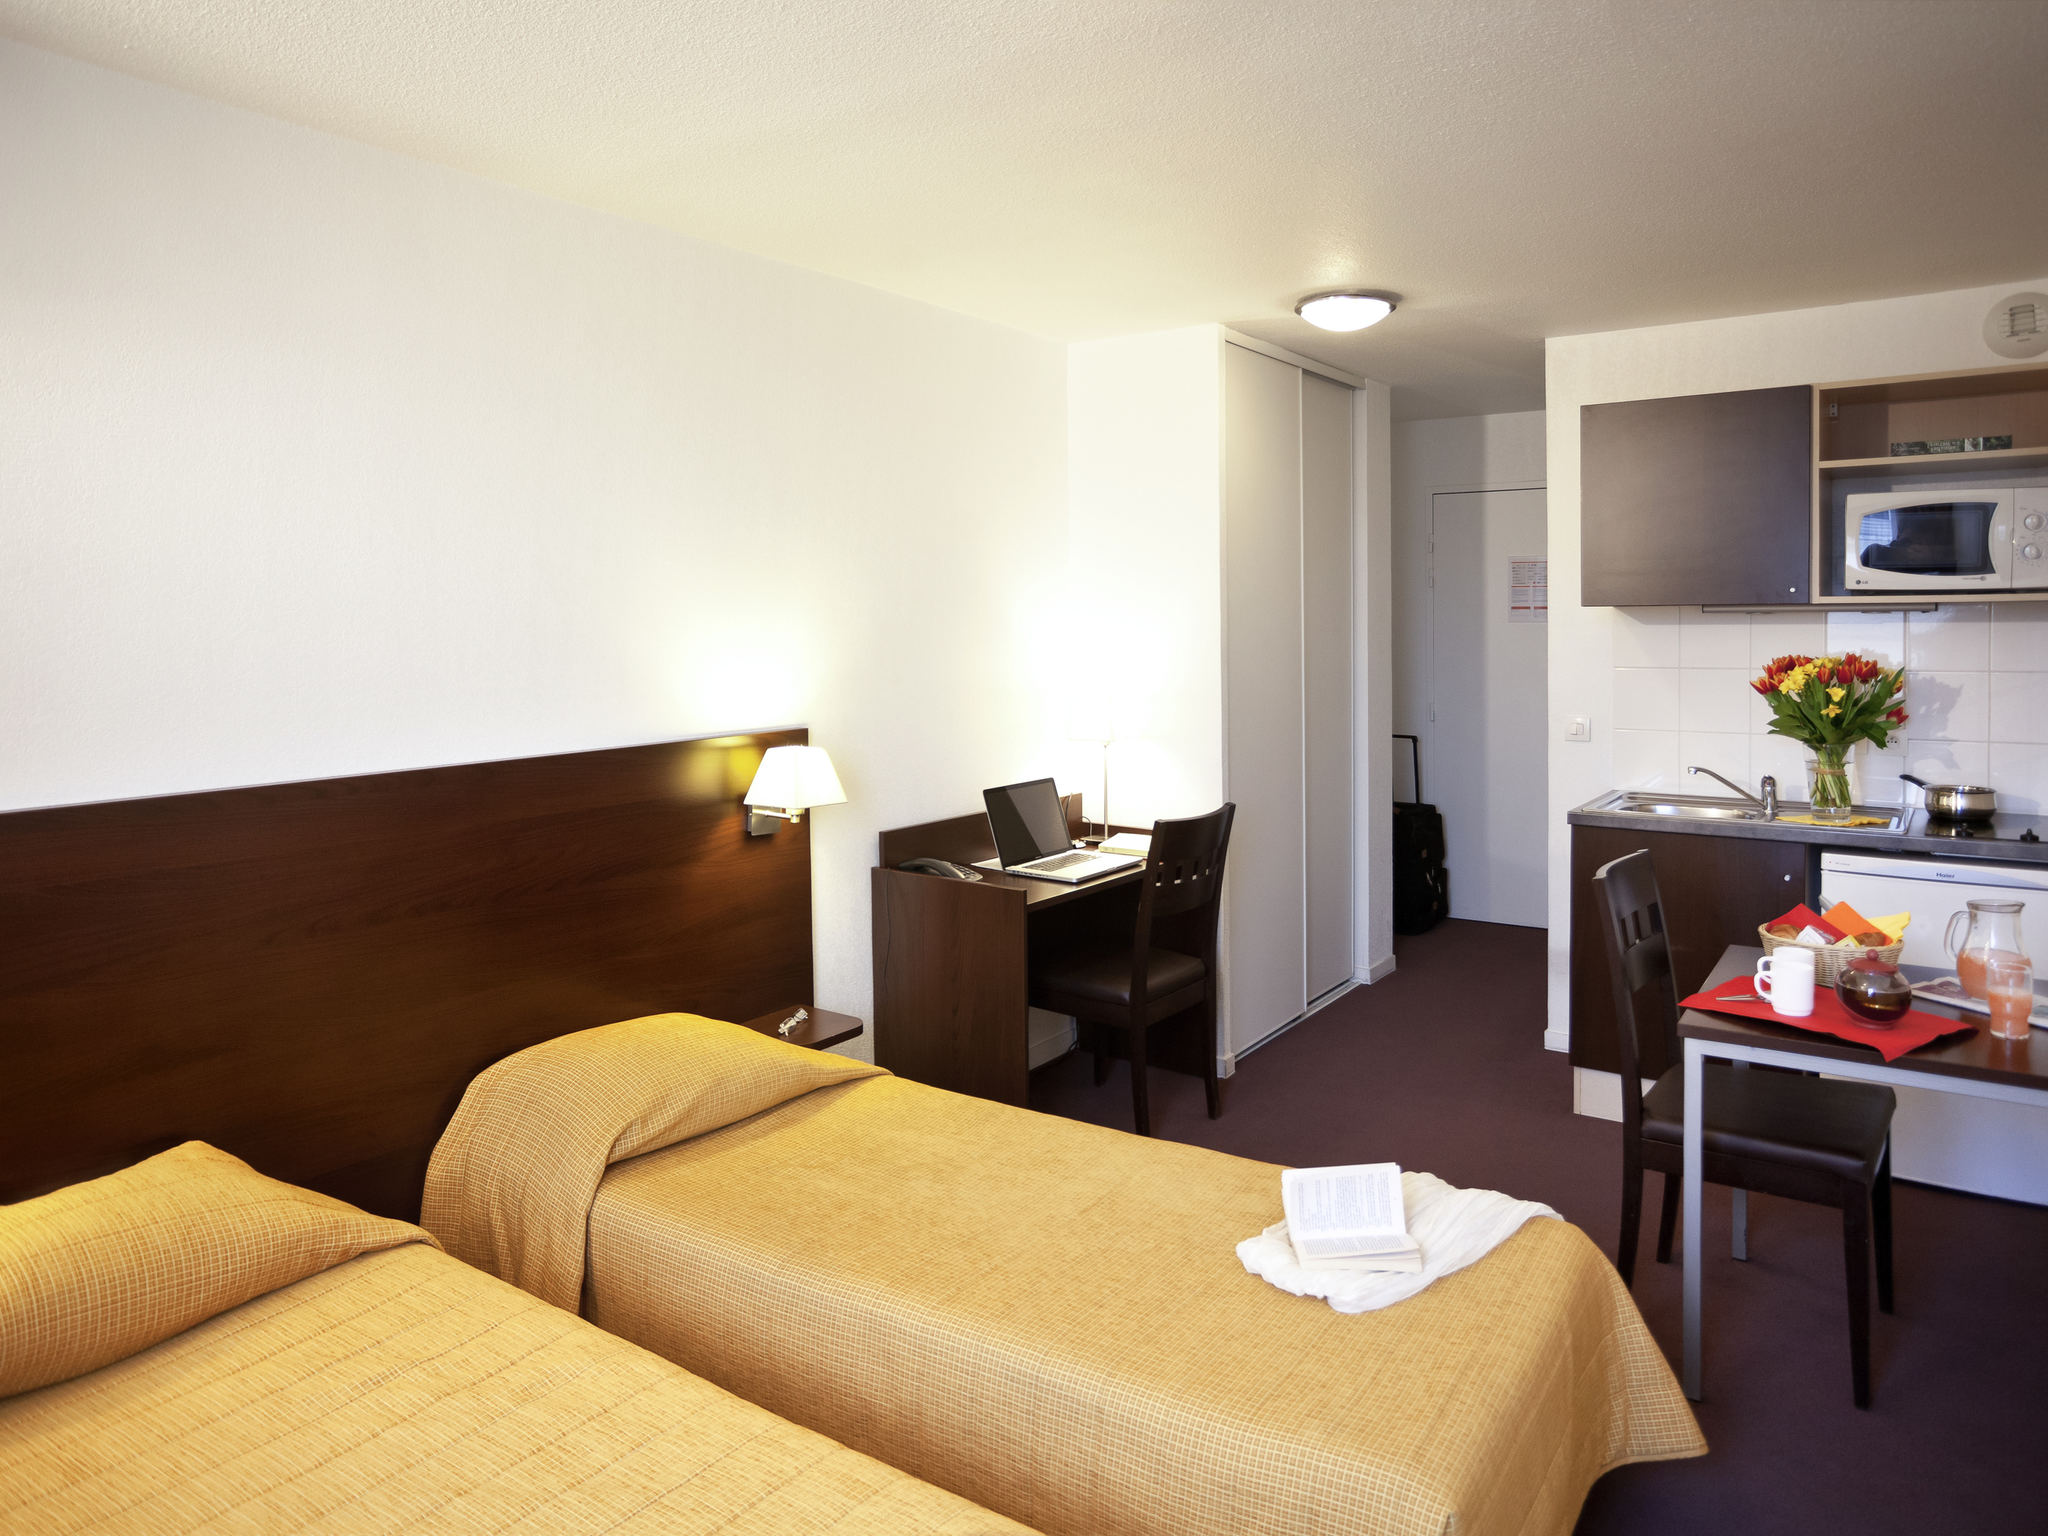 Appart Hotel Saint Denis